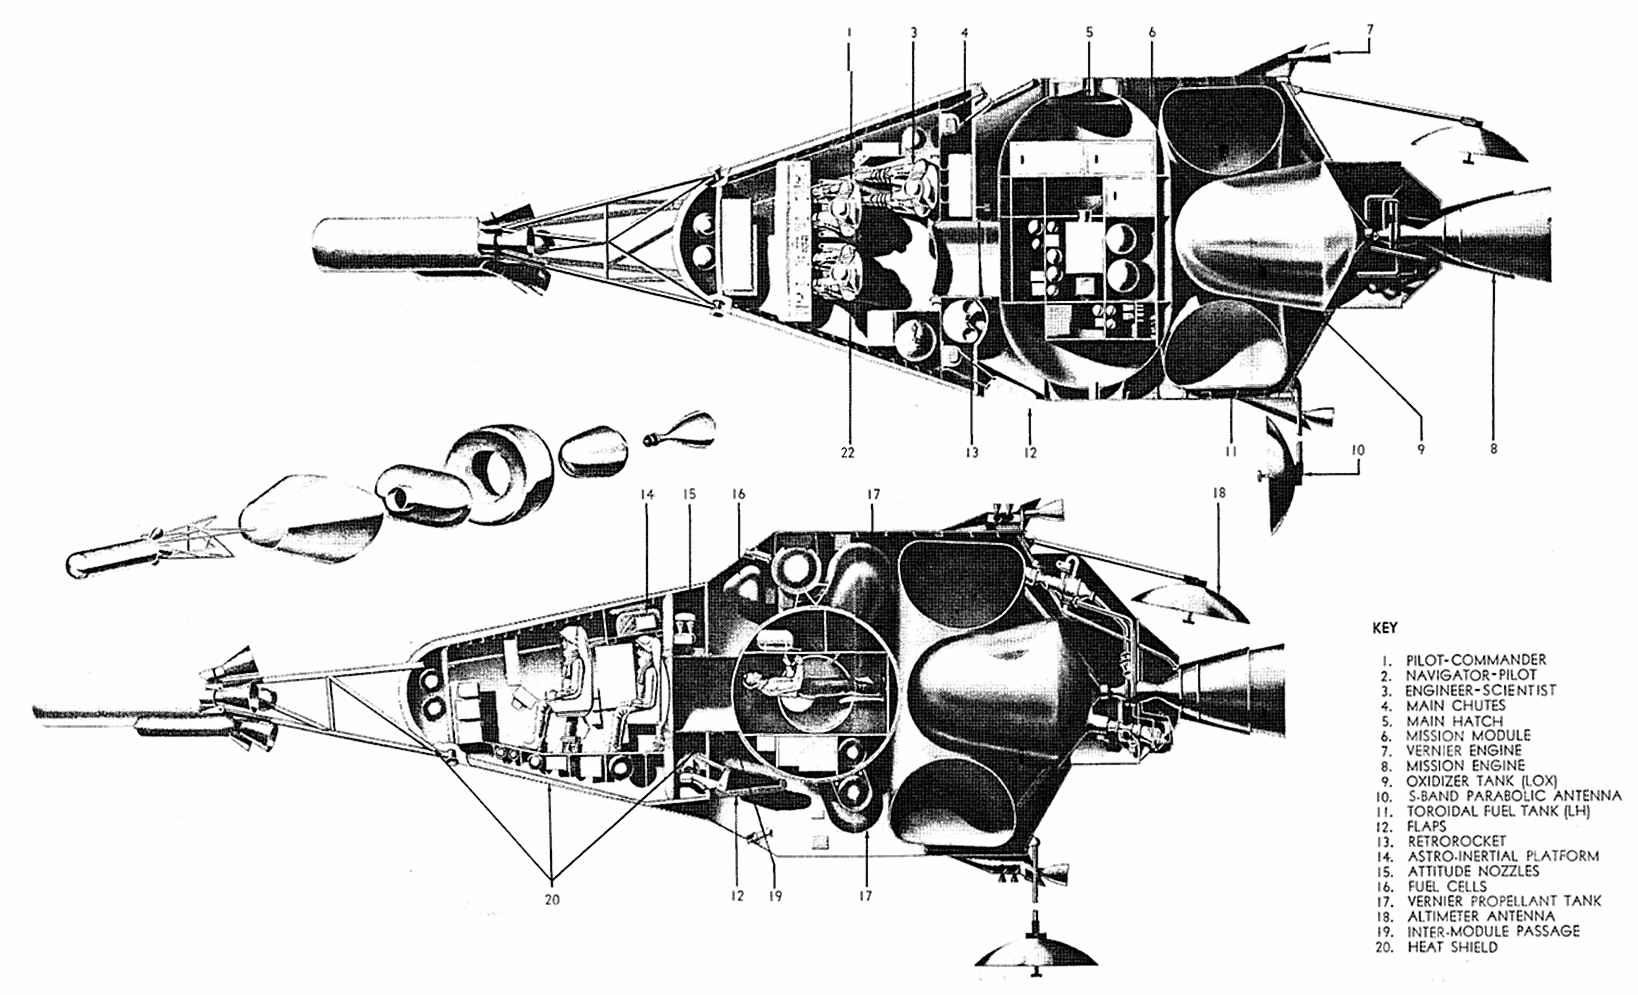 spaceship cutaway diagram modine gas heater wiring space capsule false steps page 2